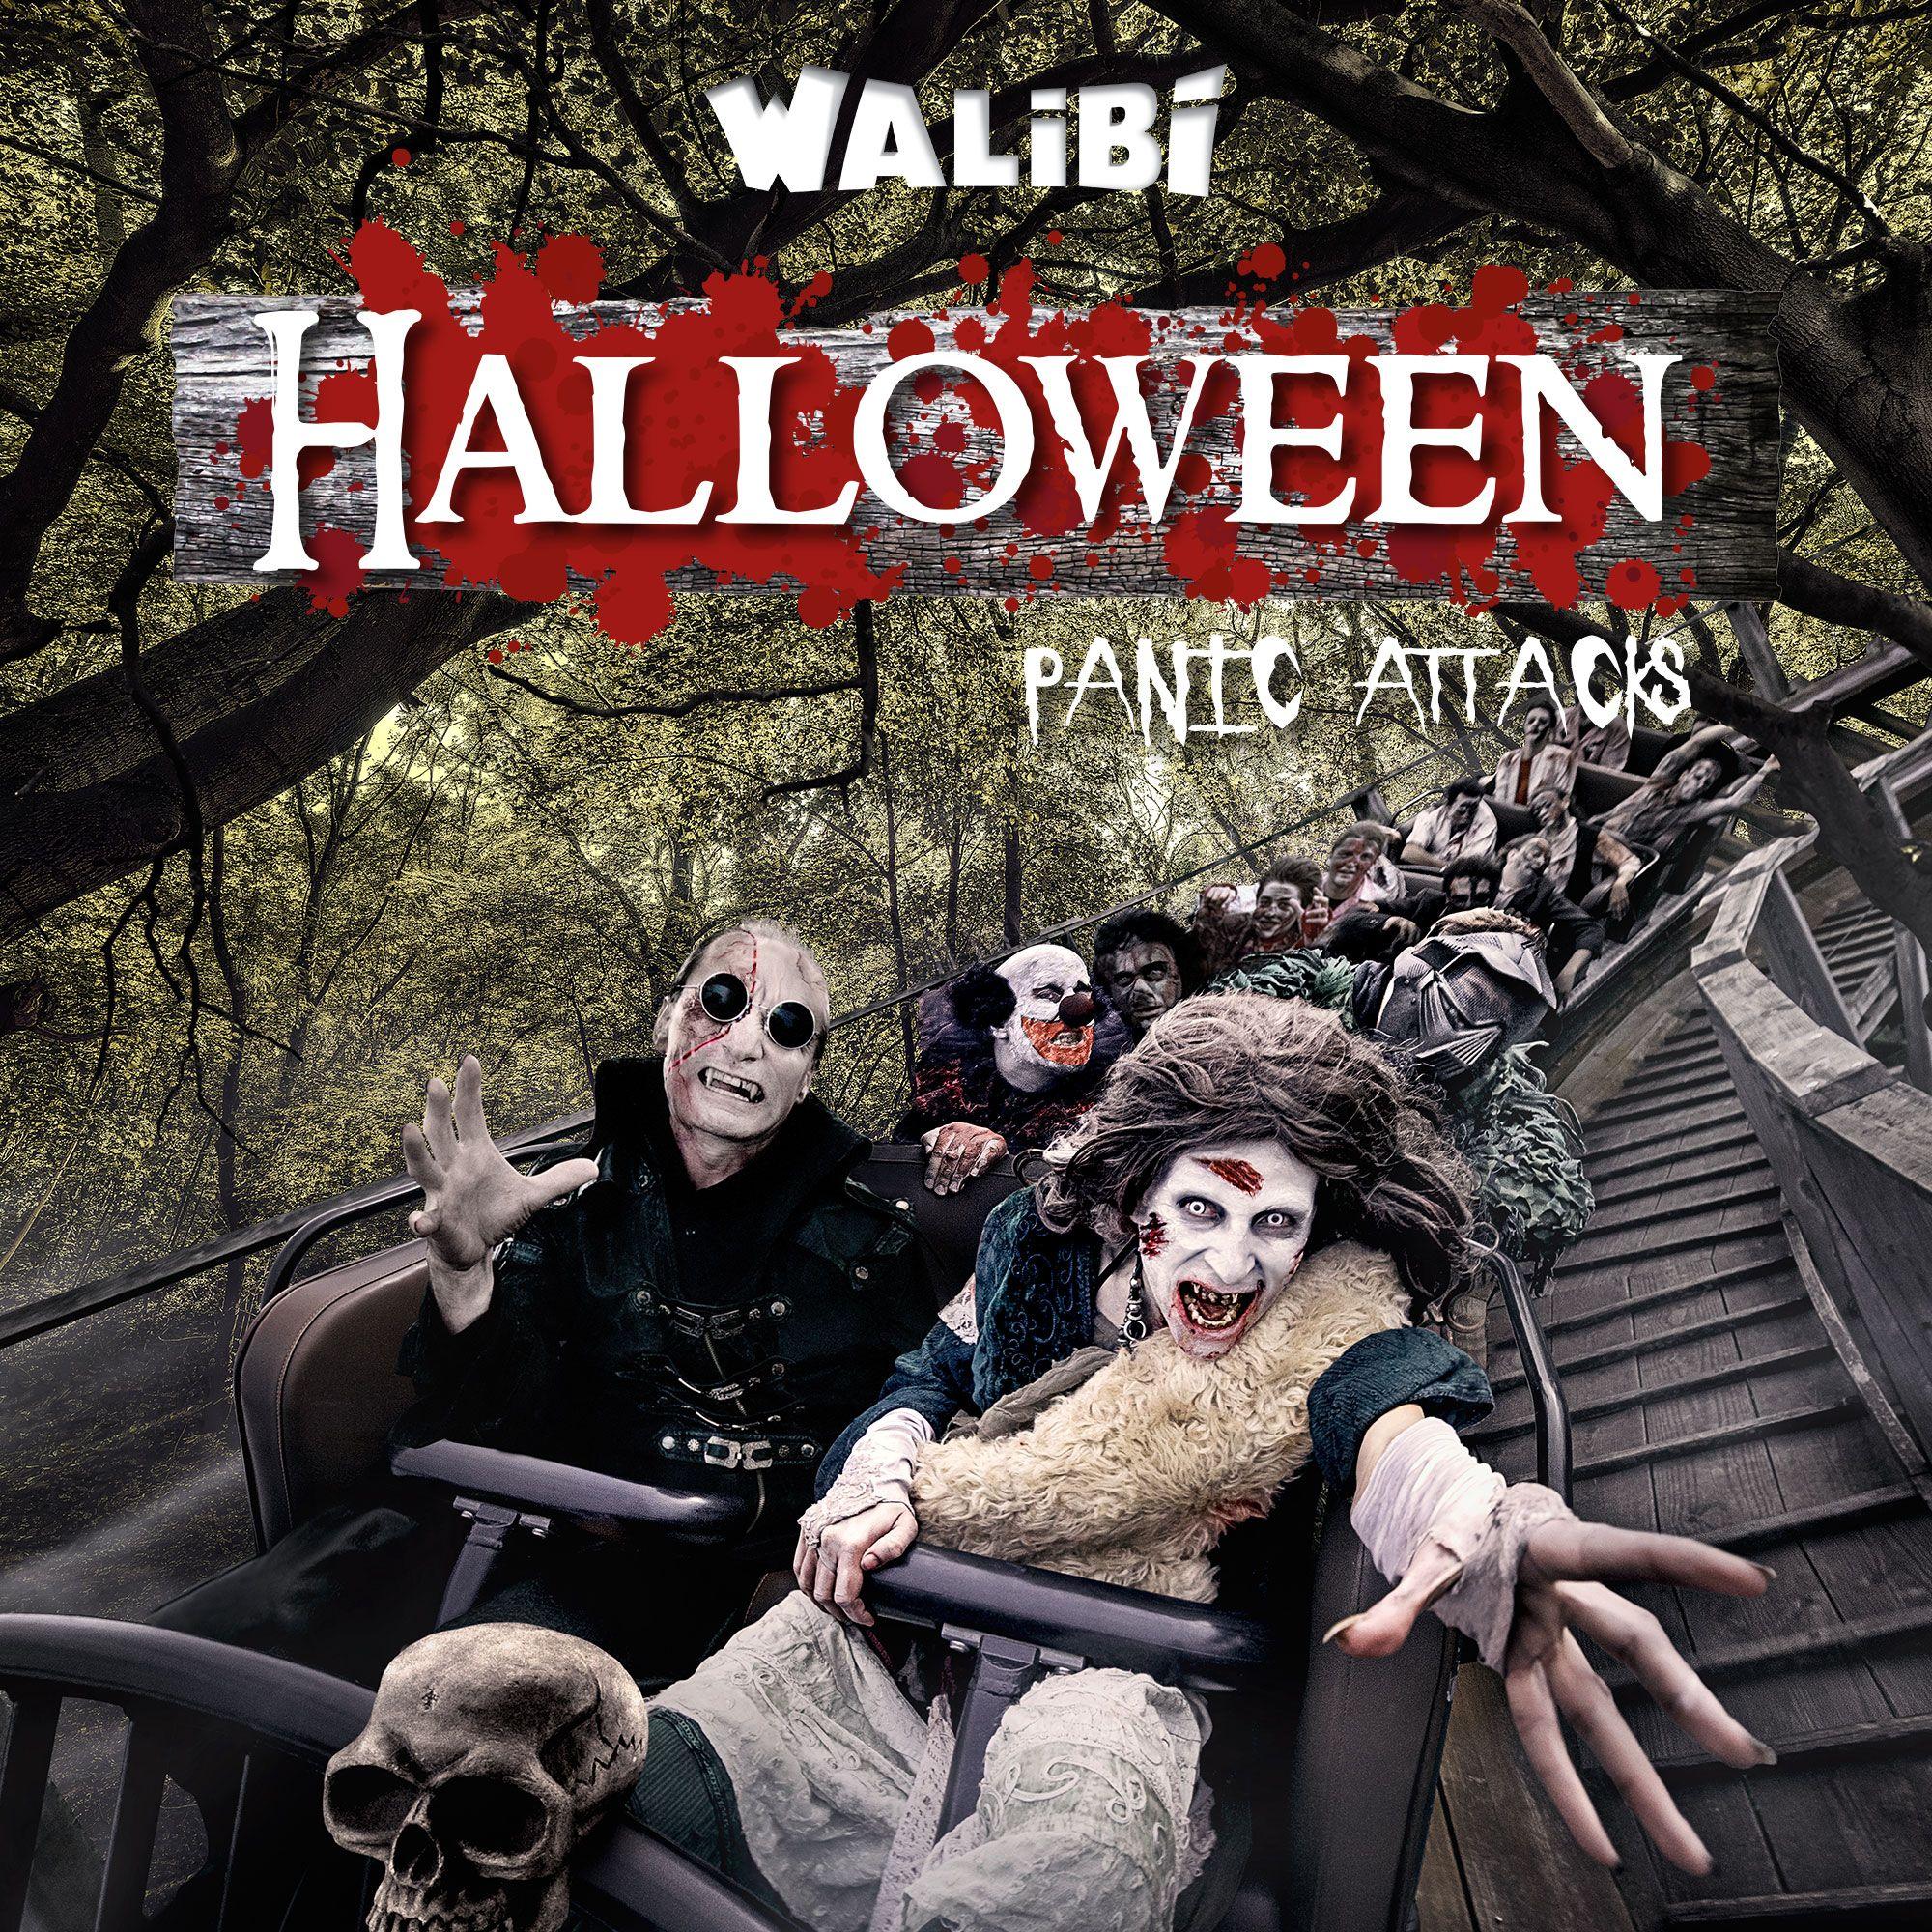 Walibi Belgique Halloween.Walibi Belgium Fan Walibifan On Pinterest